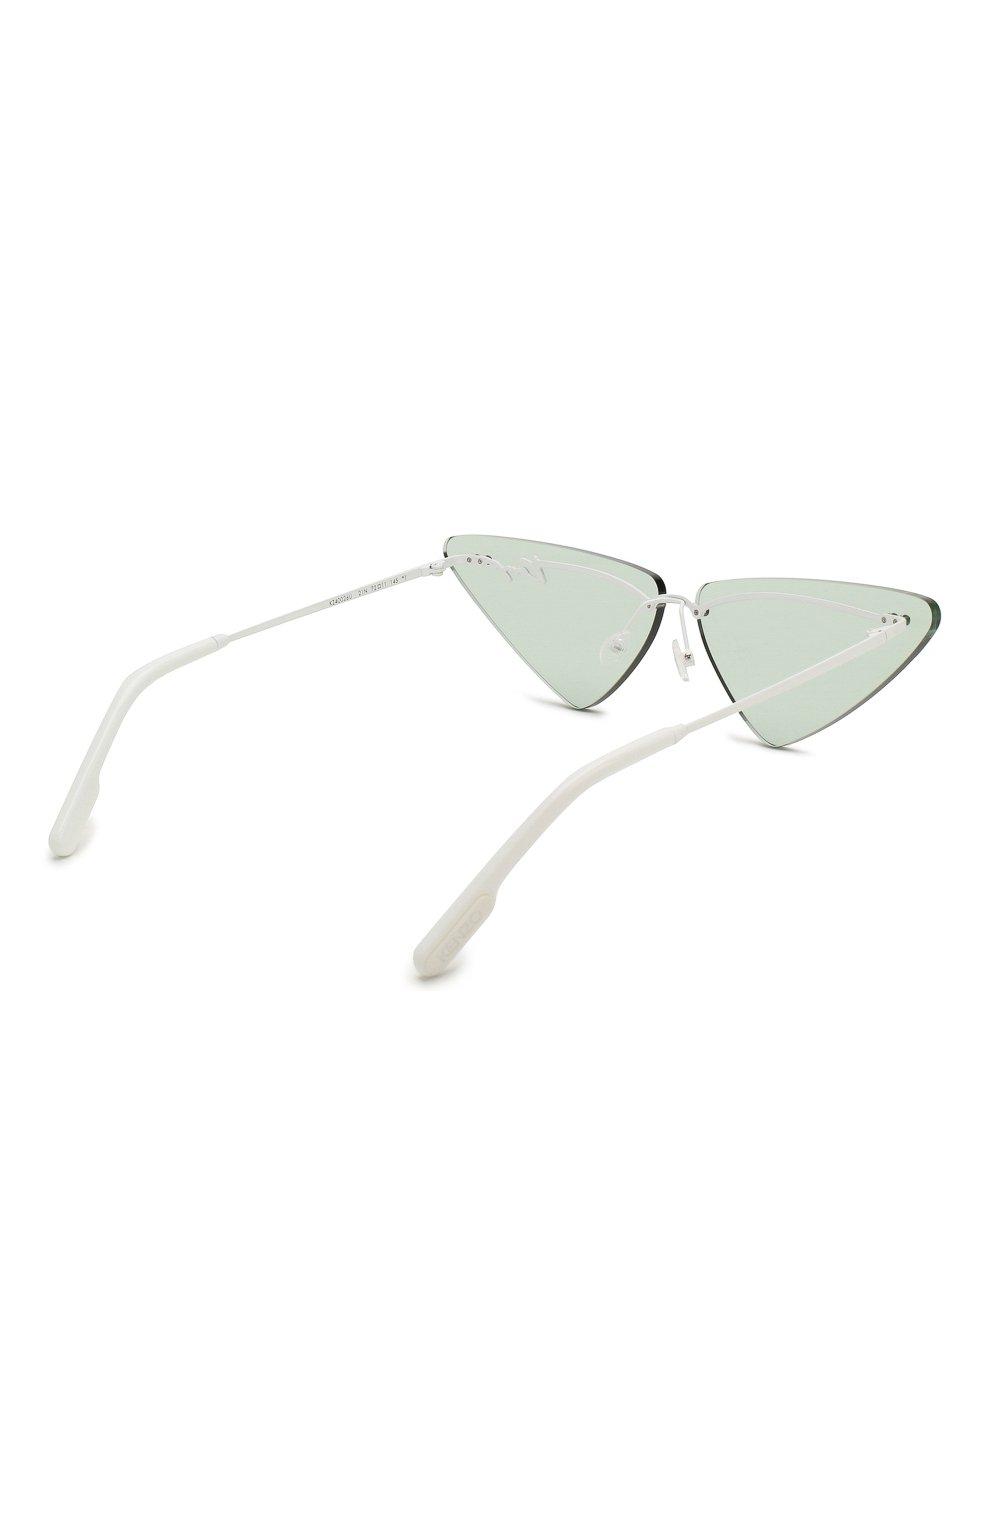 Женские солнцезащитные очки KENZO голубого цвета, арт. KZ40026U 21N   Фото 4